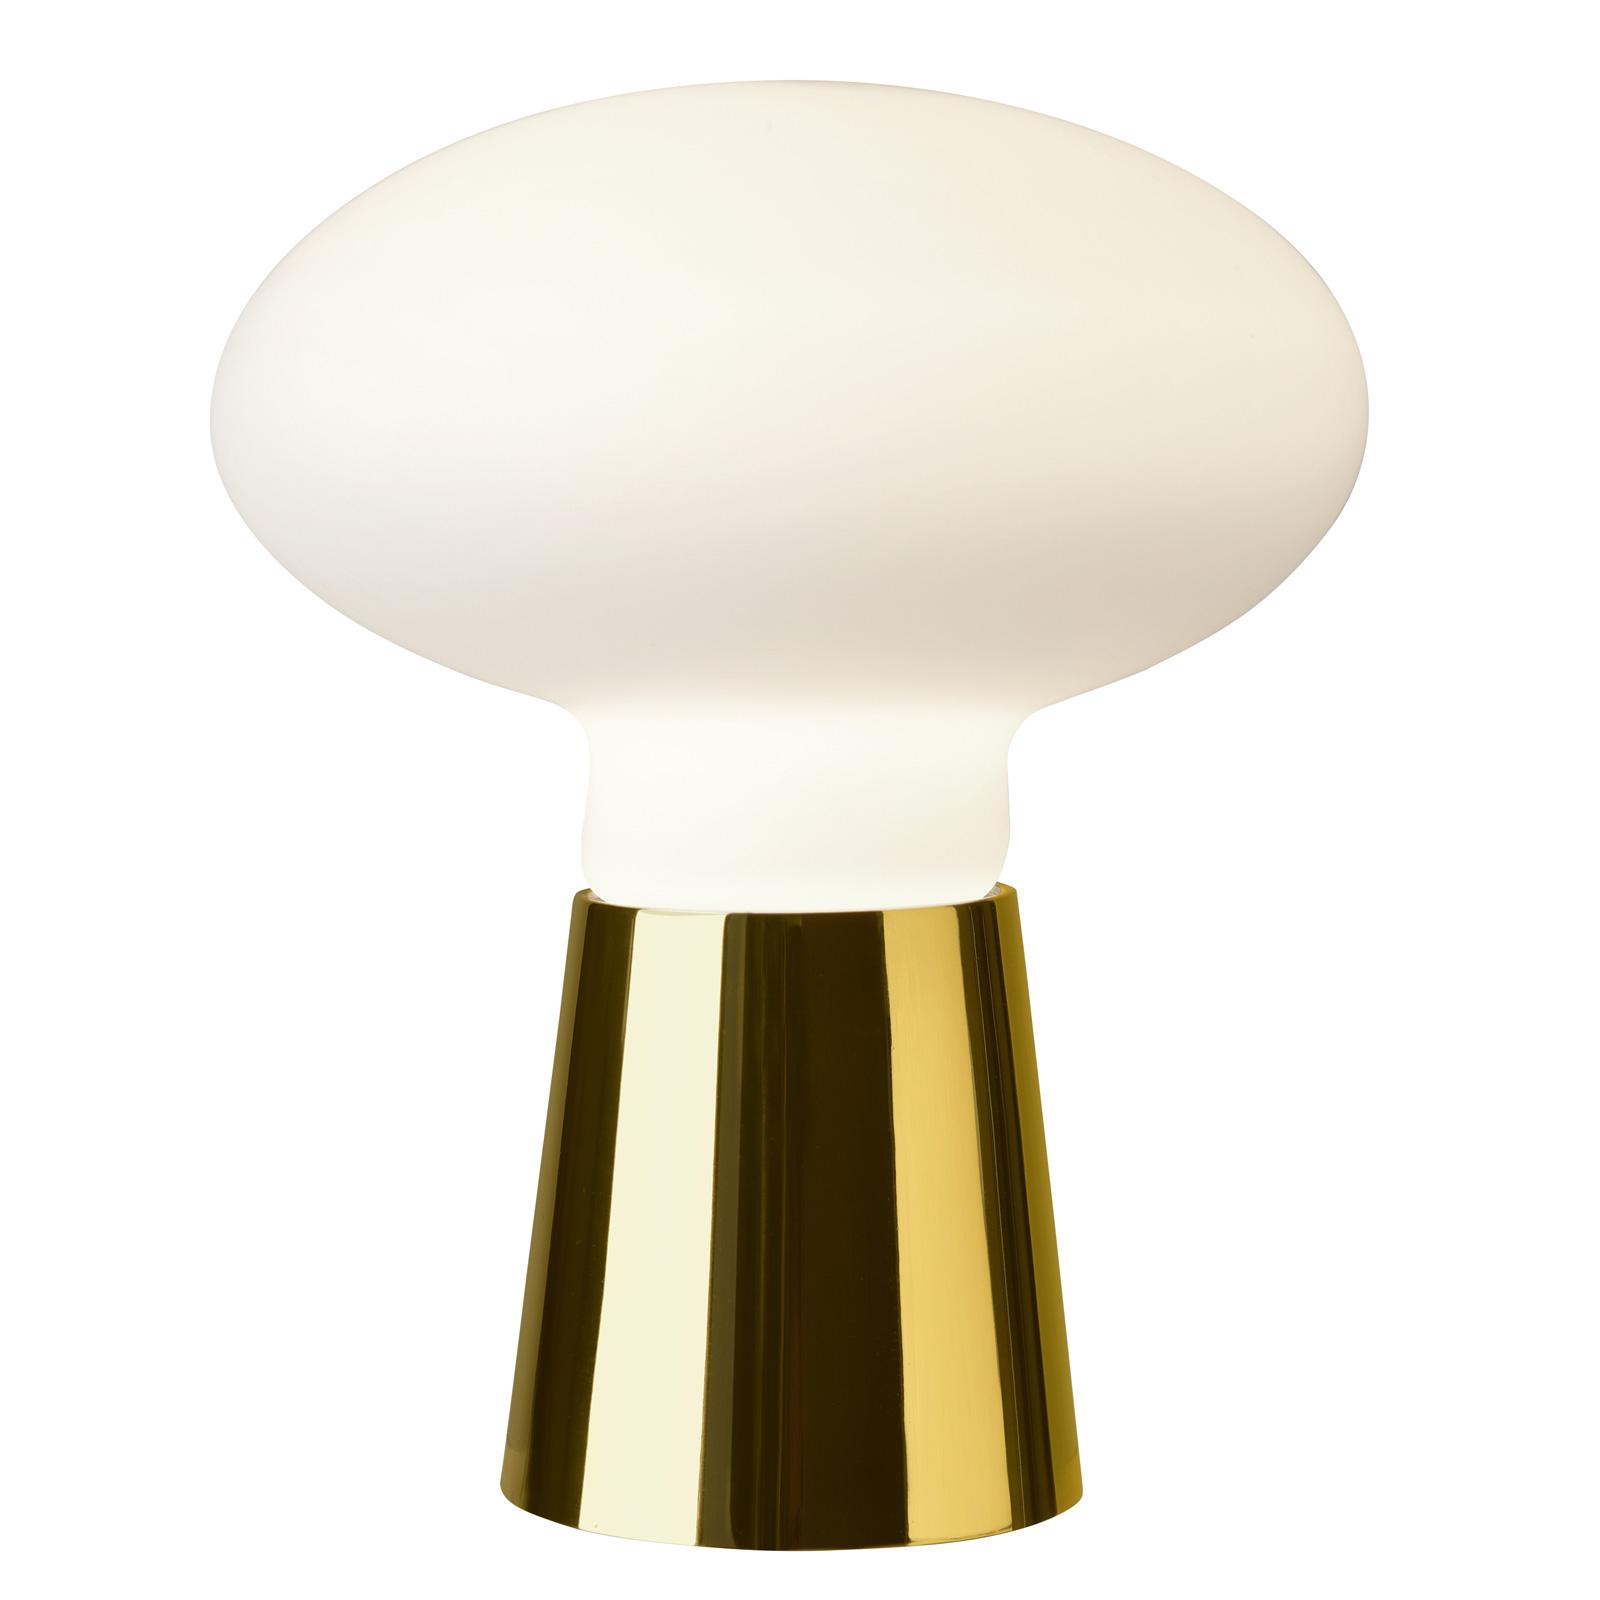 Villeroy & Boch Bilbao tafellamp goudlook 35 cm